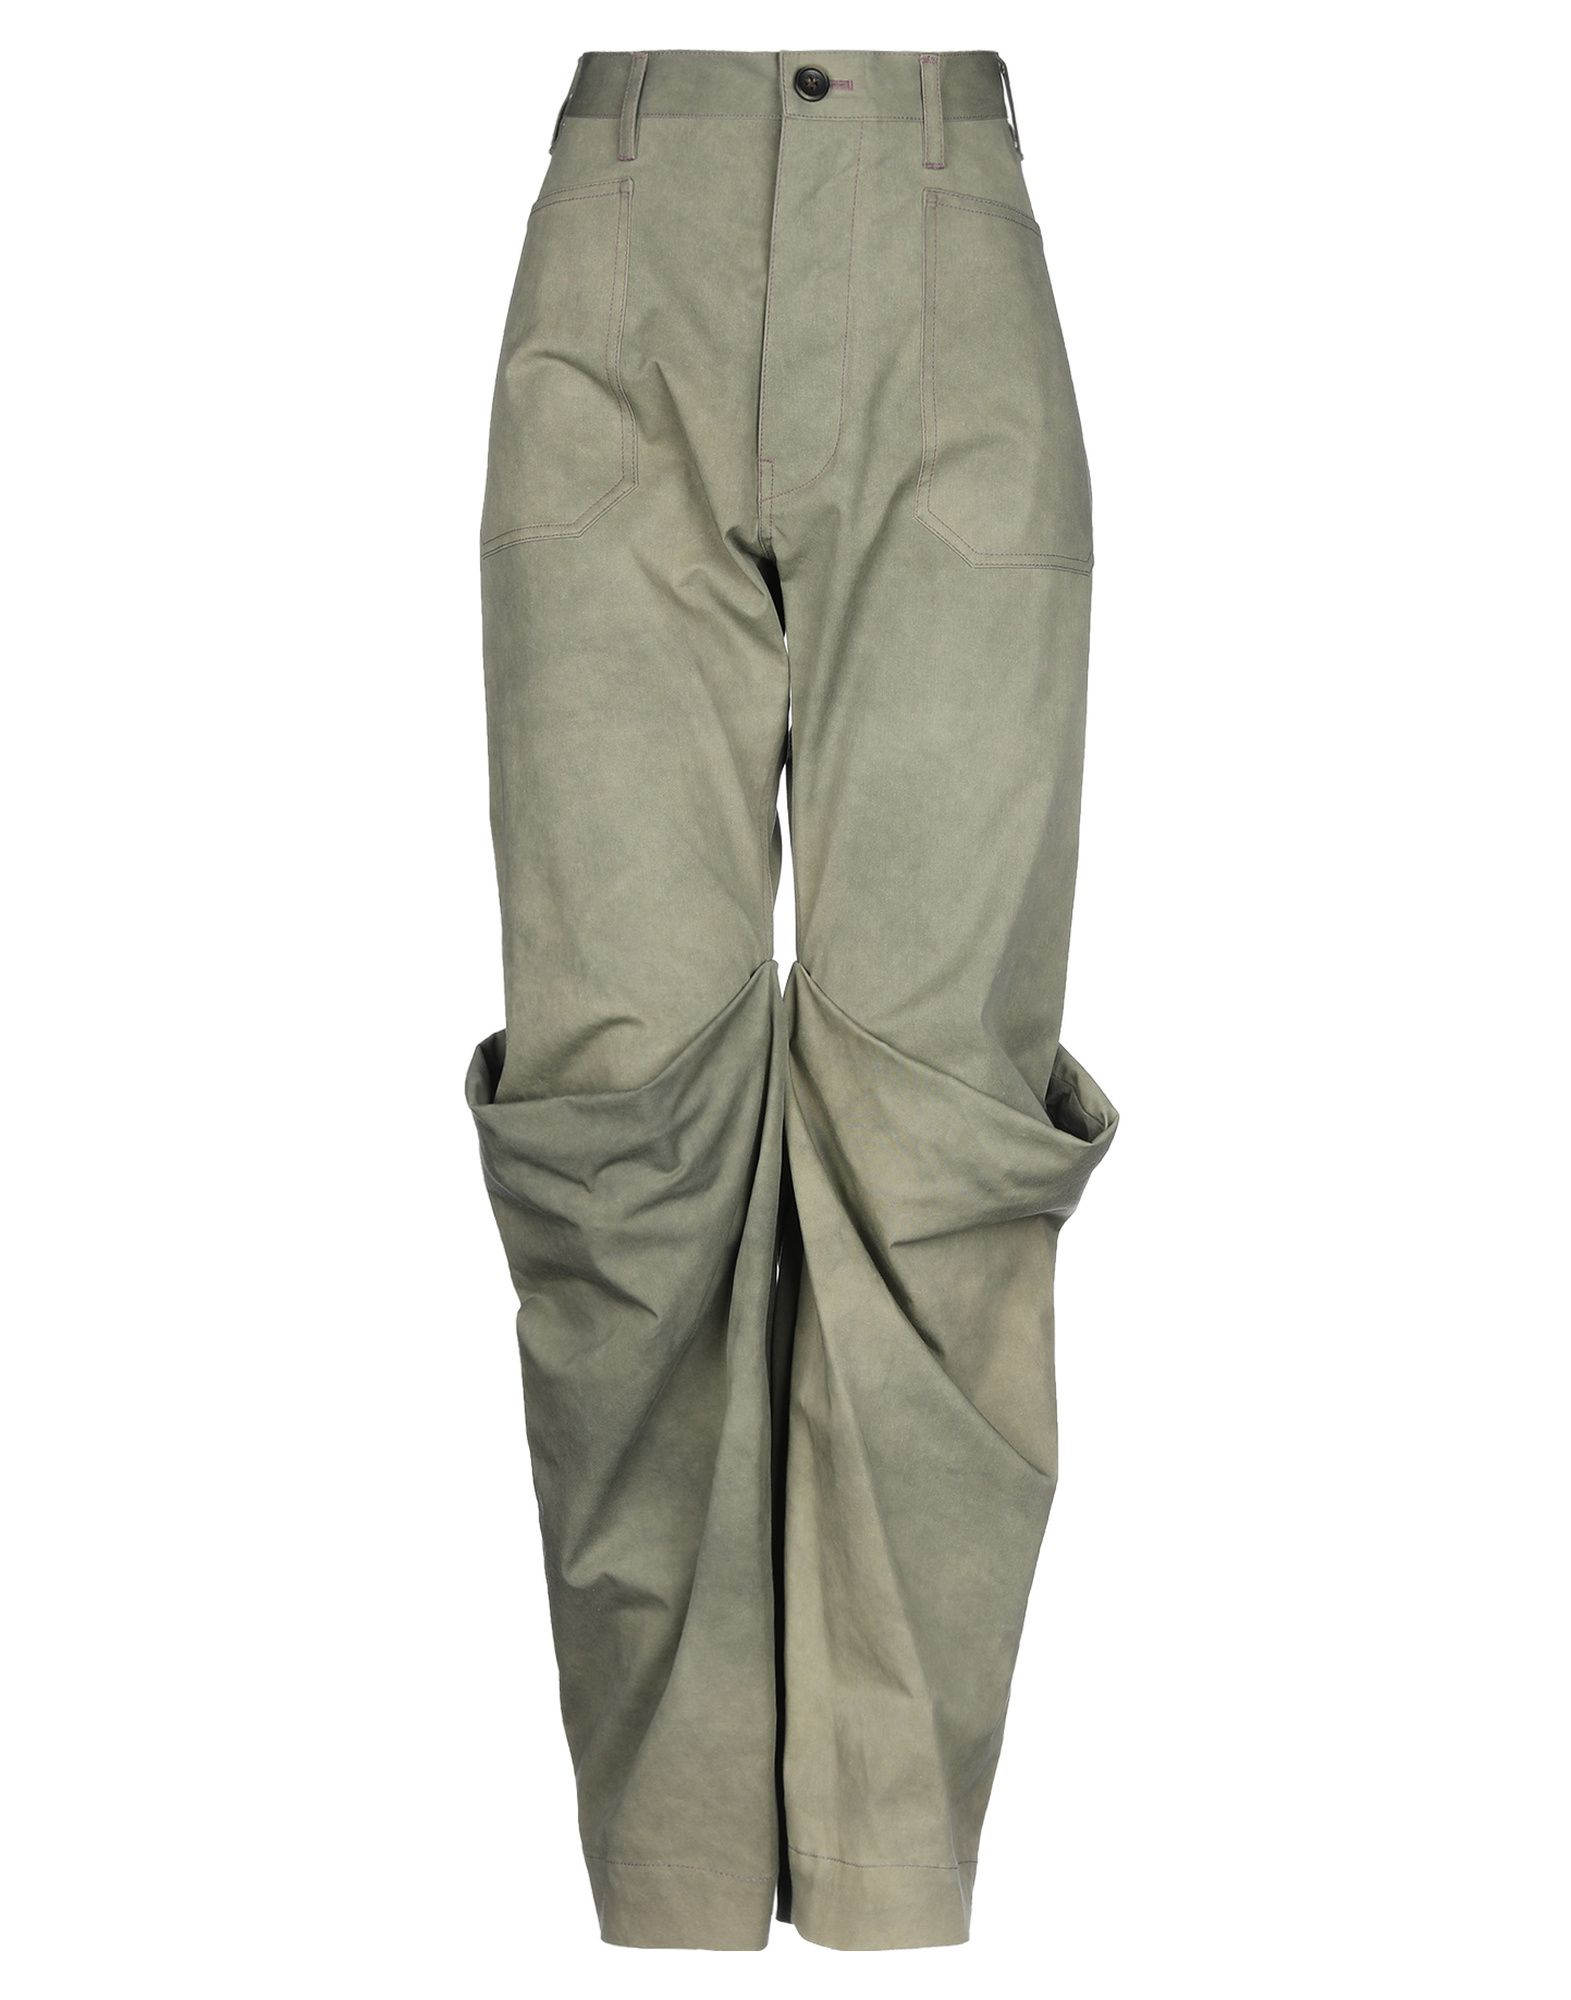 ANDREAS KRONTHALER x VIVIENNE WESTWOOD Повседневные брюки nicolas andreas taralis повседневные брюки